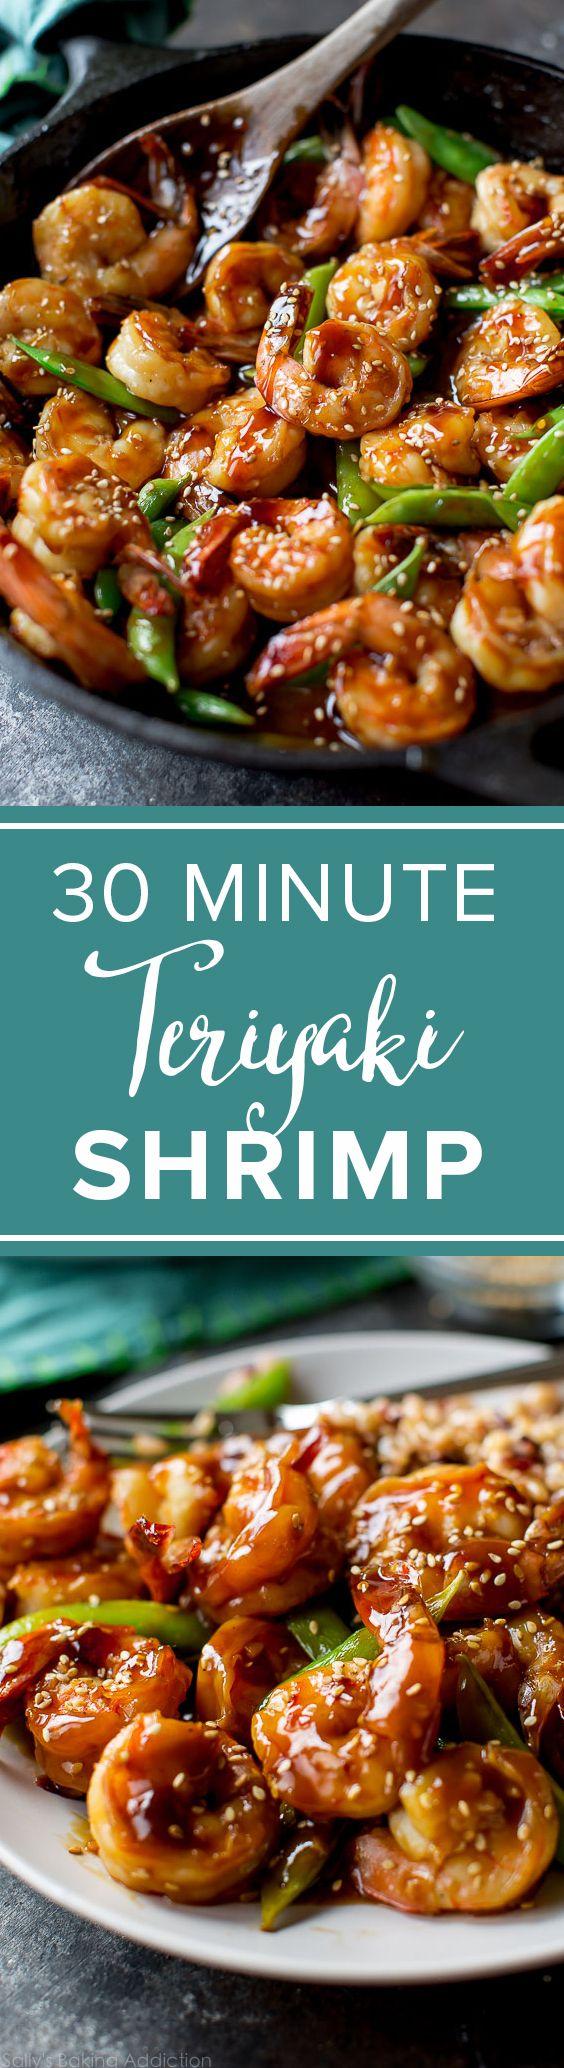 Teriyaki shrimp in only 30 minutes! Quick easy weeknight dinner recipes! Recipe on Sally's Baking Addiction http://sallysbakingaddiction.com/2016/08/15/30-minute-teriyaki-shrimp/